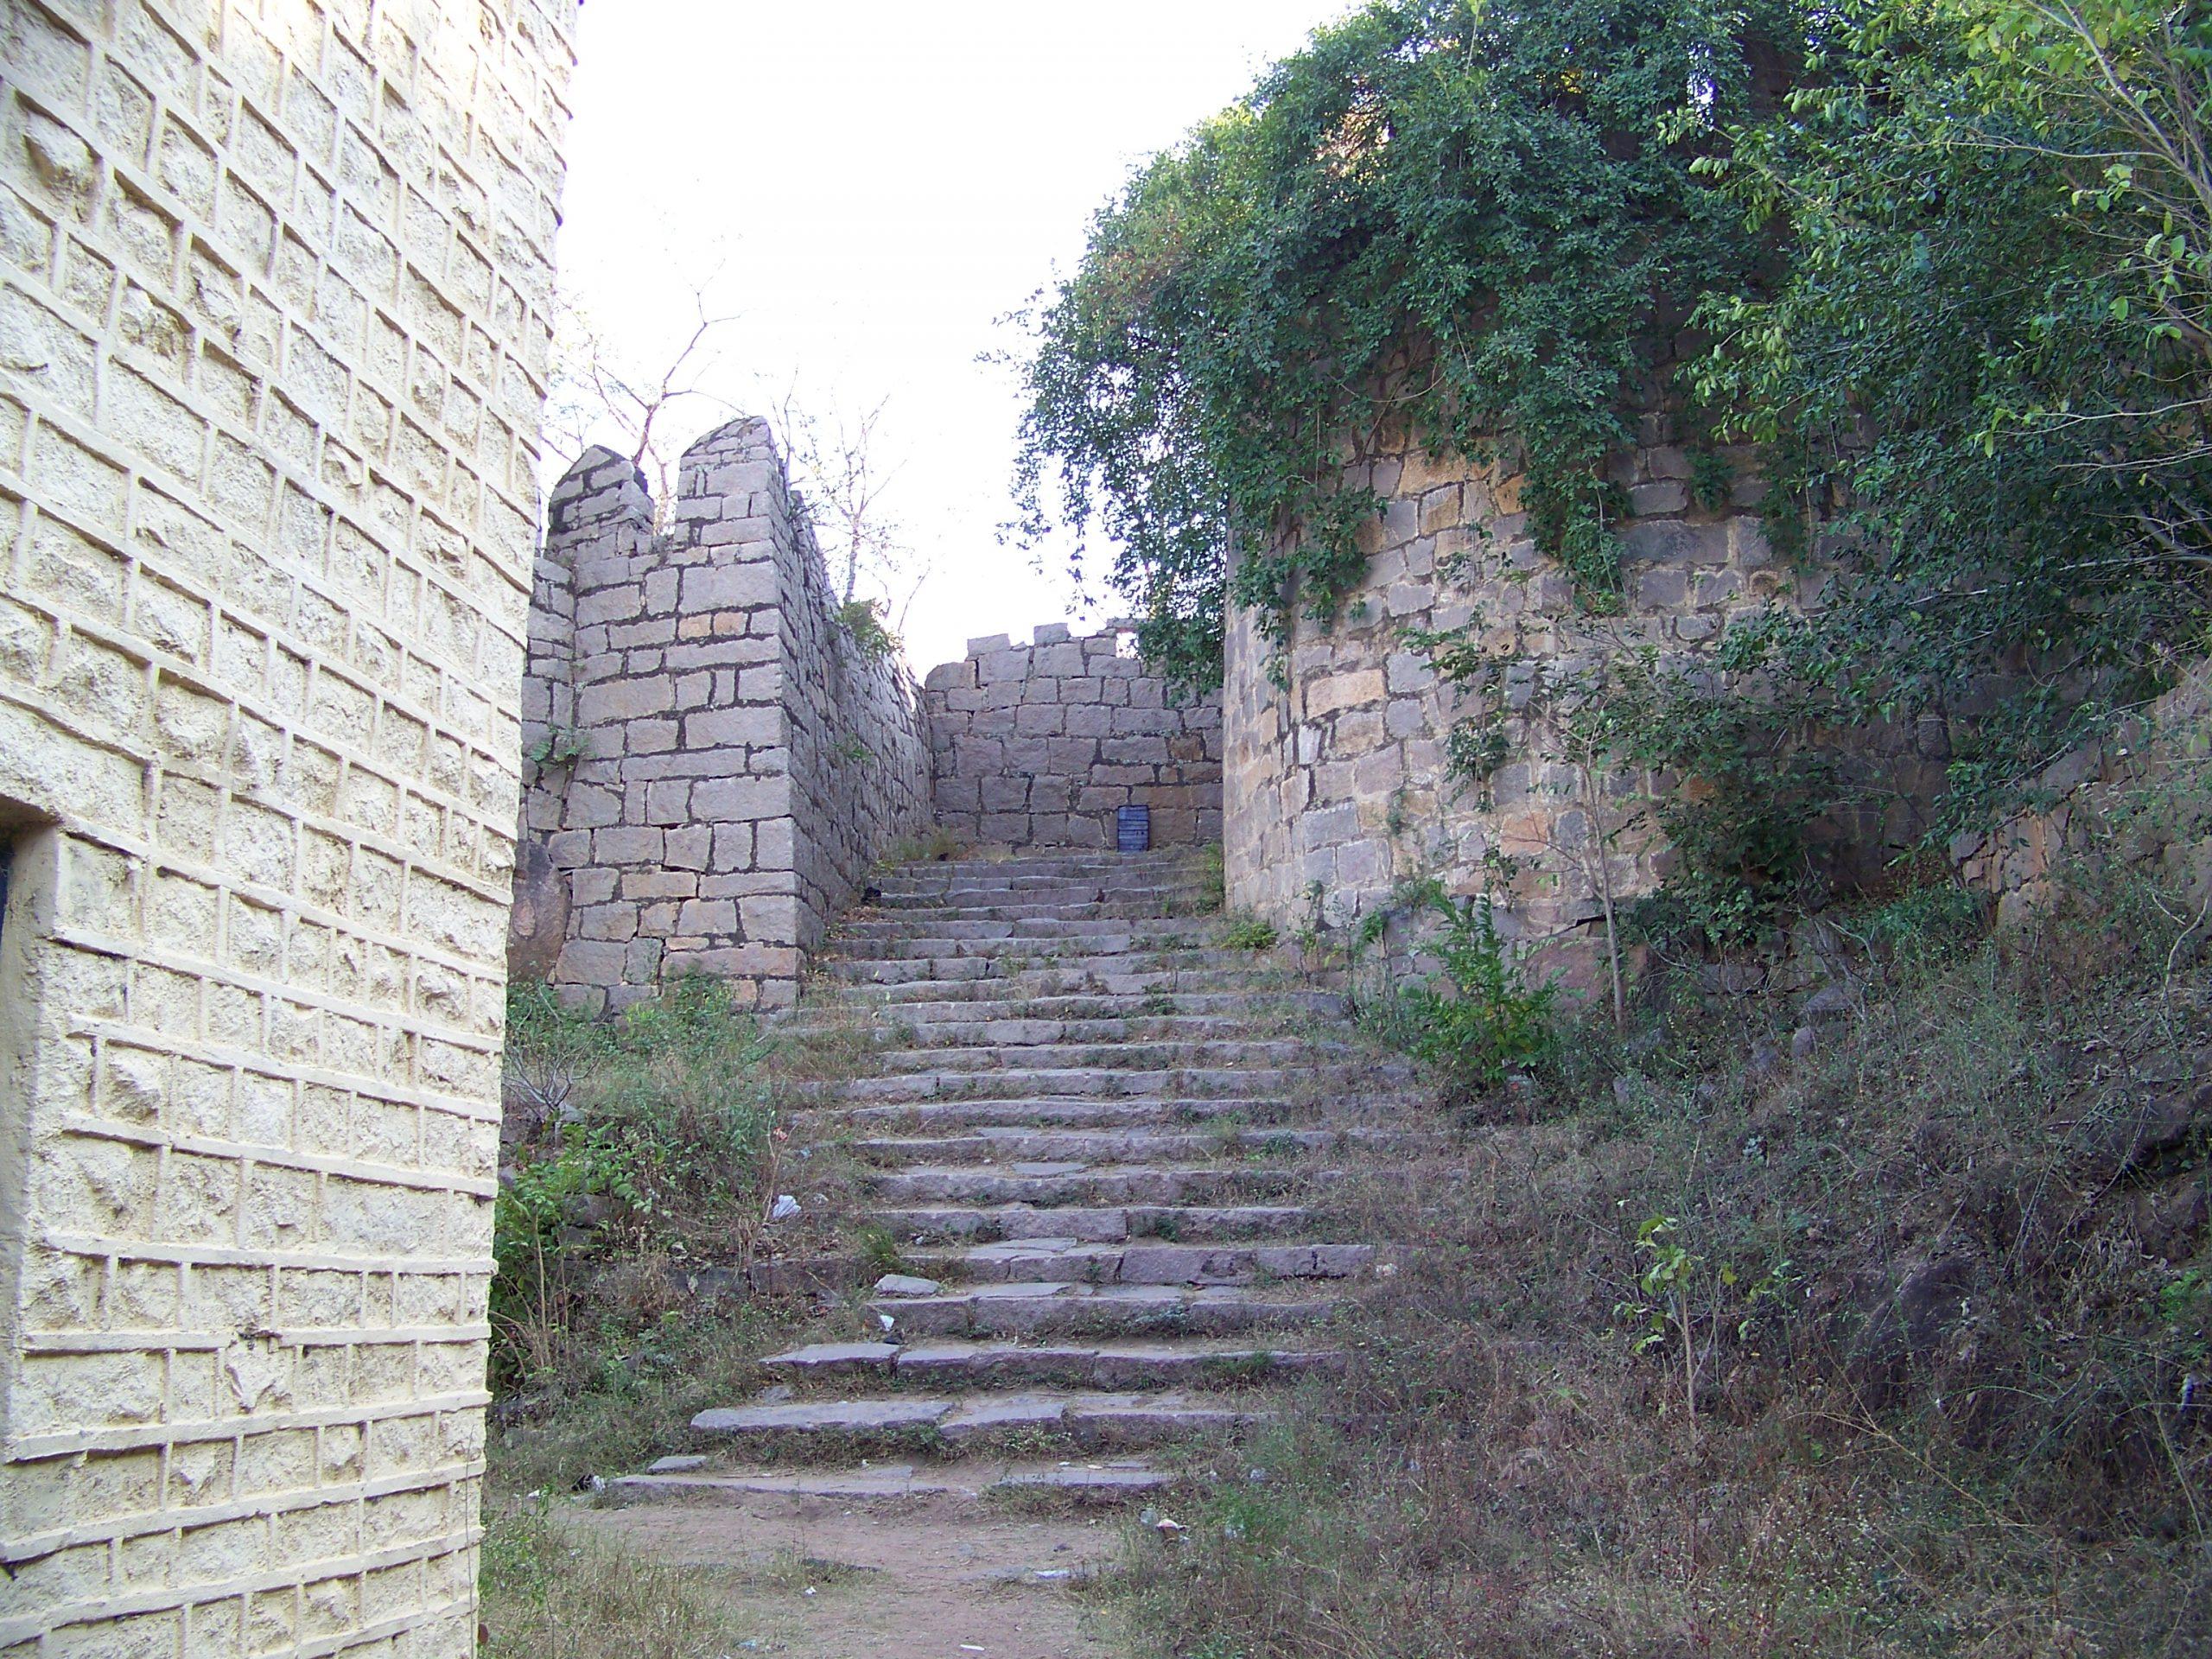 Amazing Place in Telangana-Medak Fort